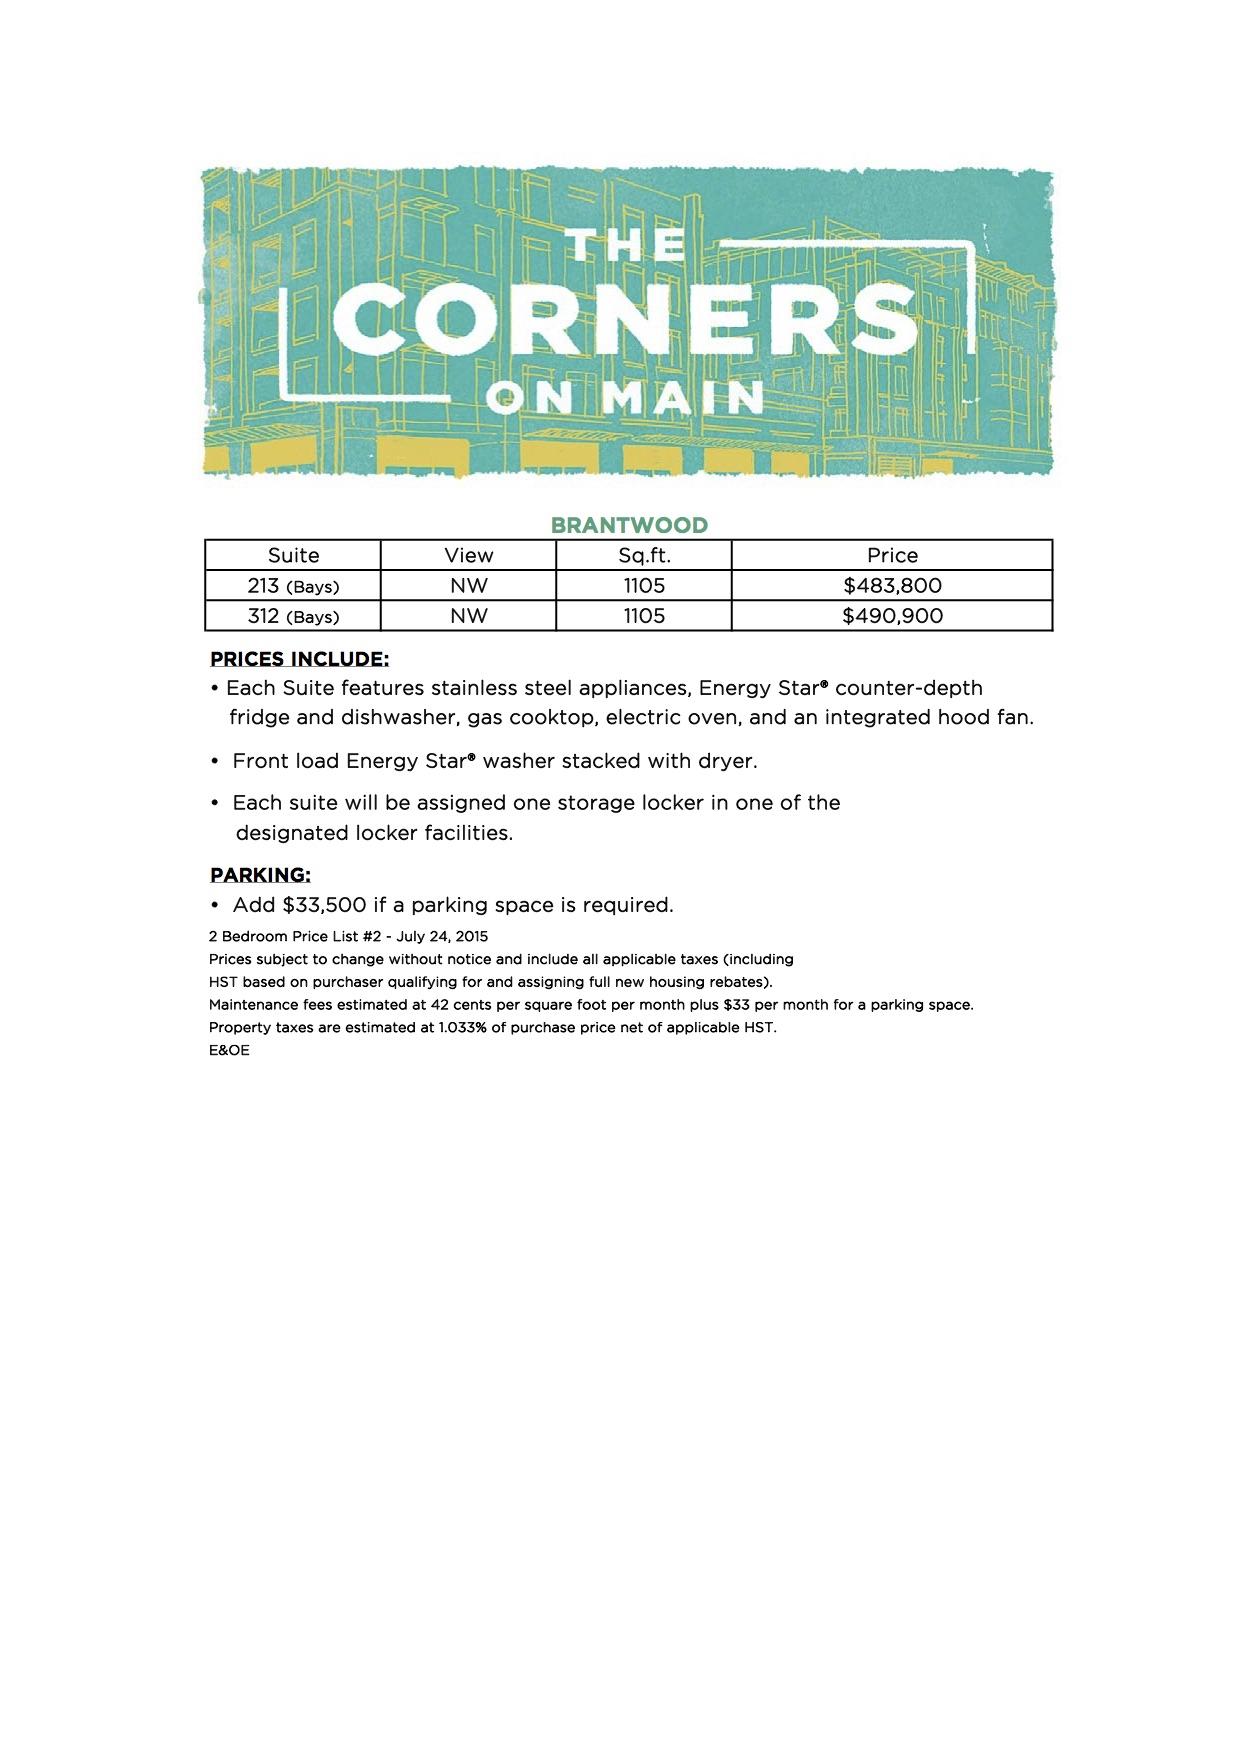 Corners On Main Pricelist_July_24_20155.jpg